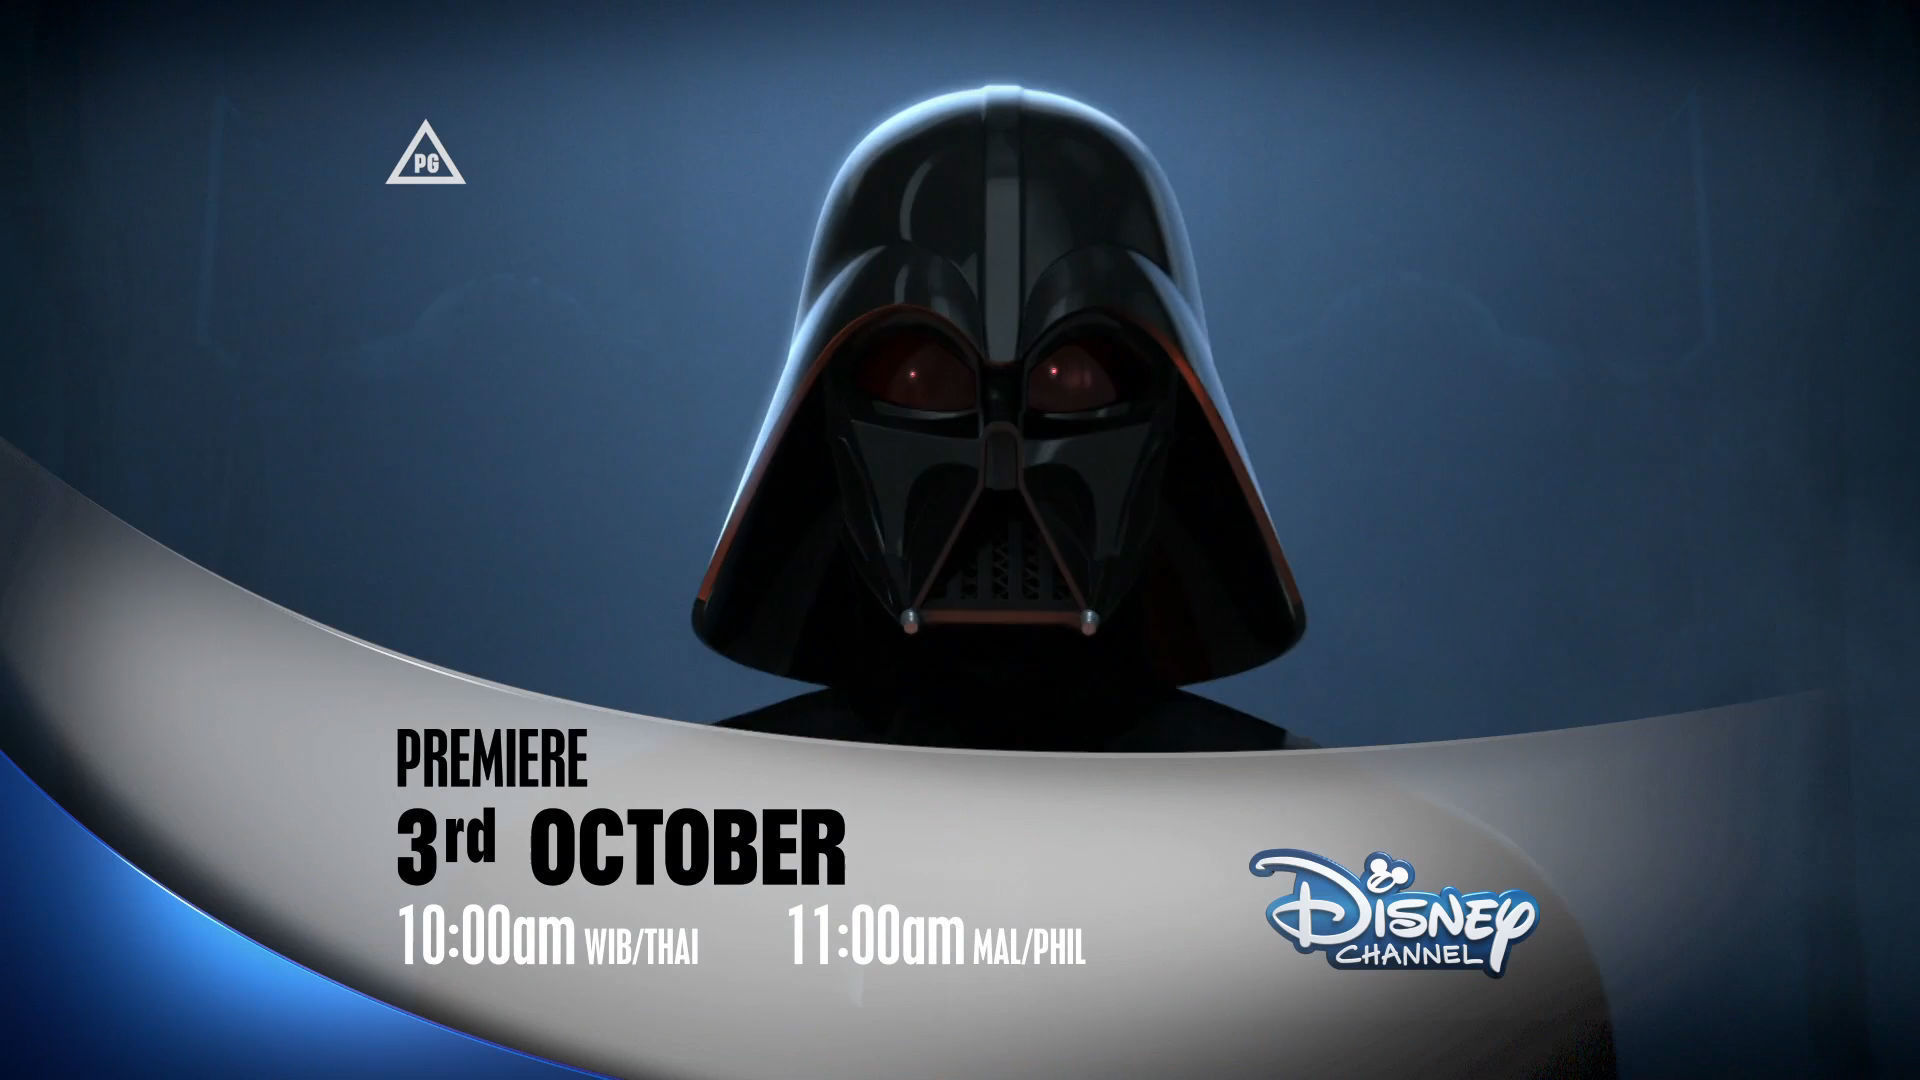 Star Wars Rebels: The Siege of Lothal on Disney Channel Trailer 1